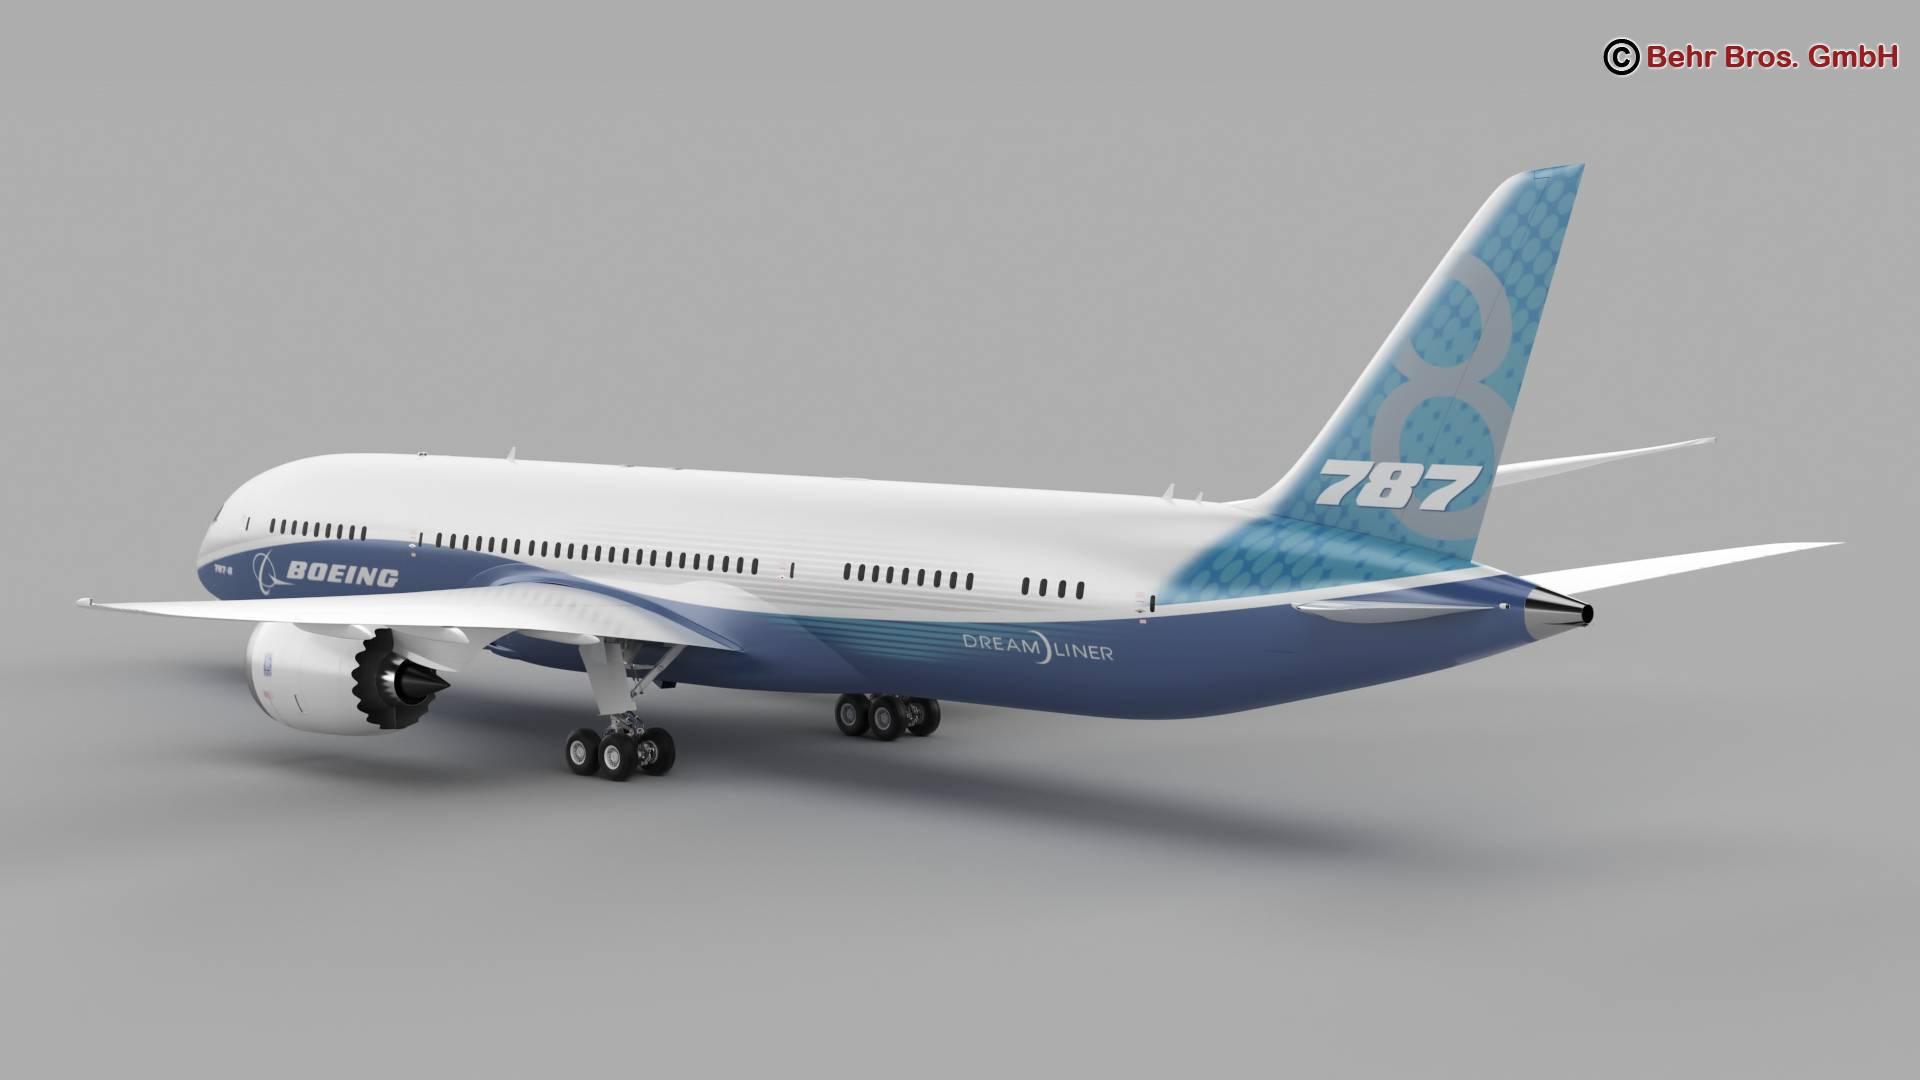 boeing 787-8 3d model 3ds max fbx c4d lwo ma mb obj 251358